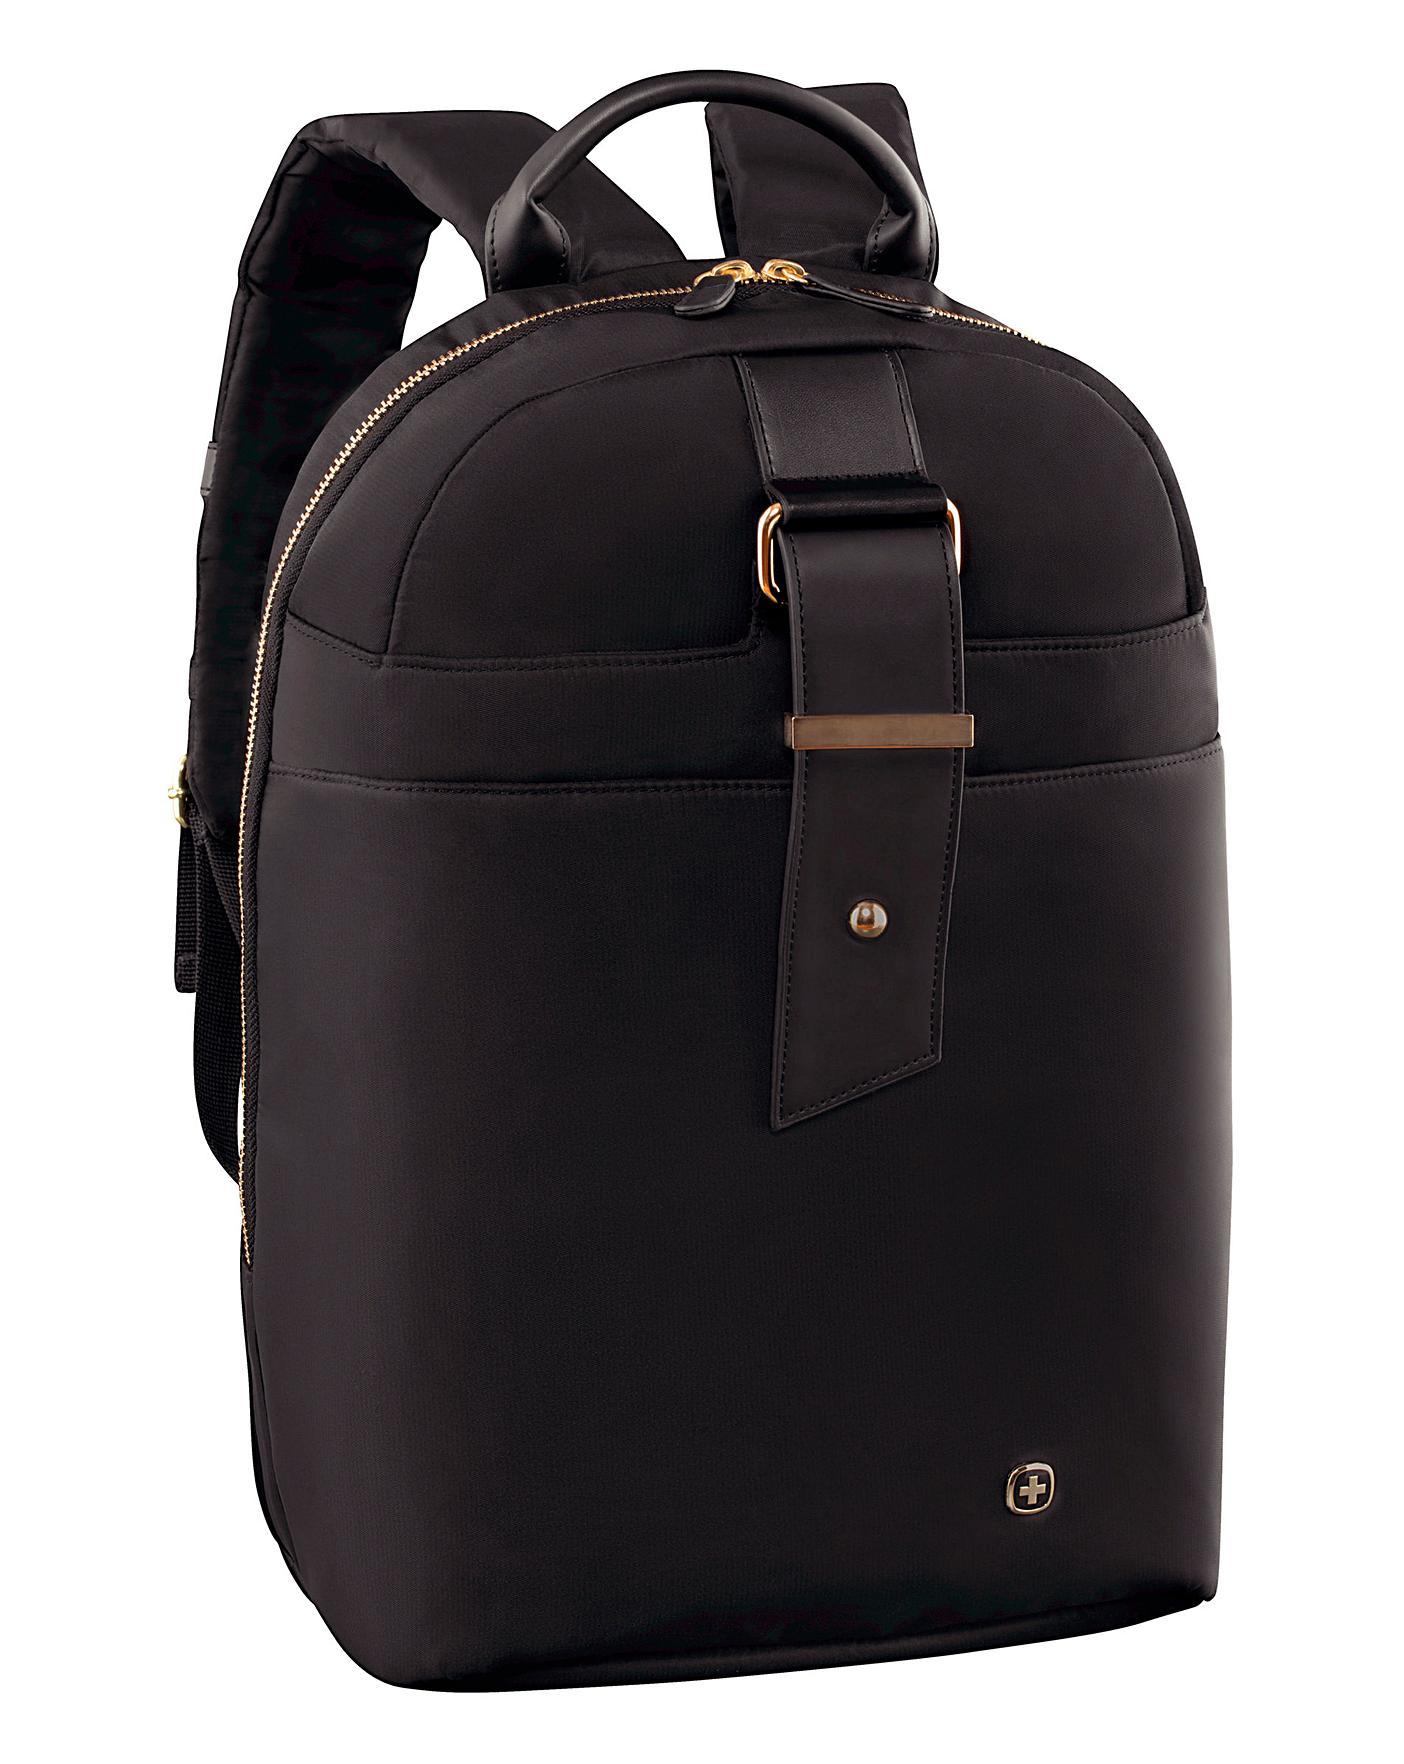 Wenger Las Alexa Laptop Backpack